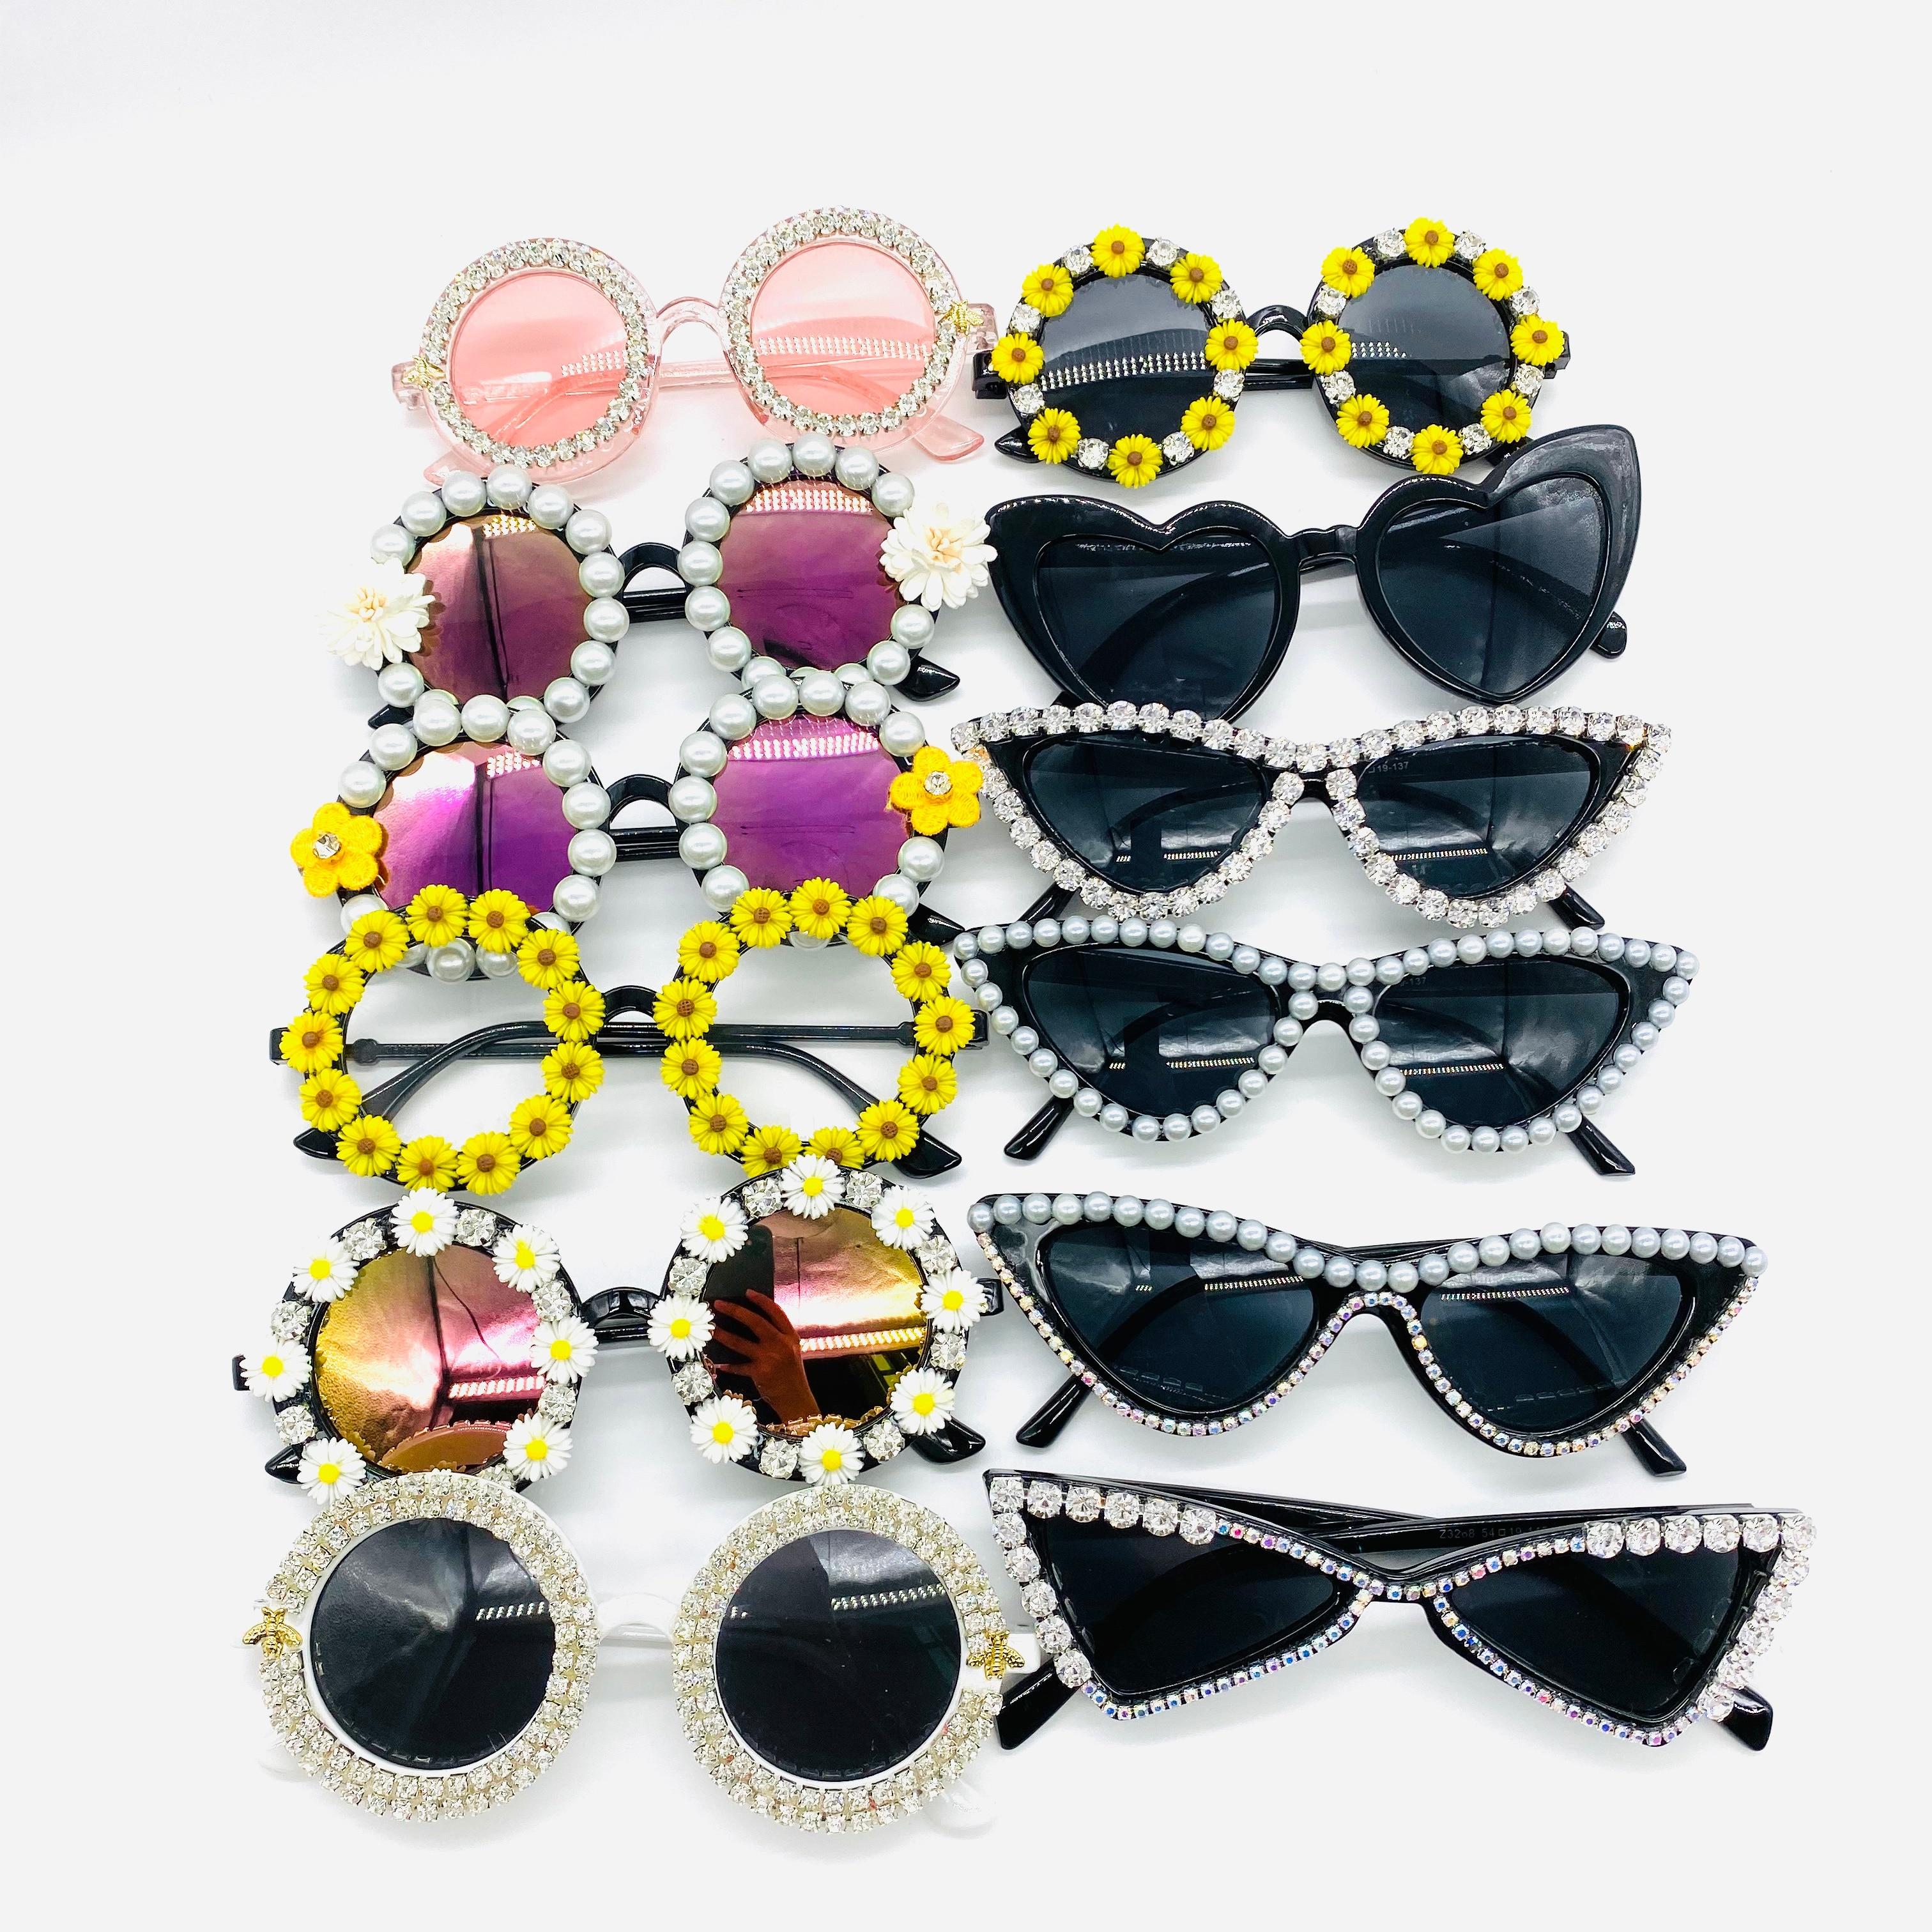 Zaolihu Fashion Diamond Women Sunglasses Round Crystal Shades Black Cat Eye Female Eyewear Handmade Square Mens Sunglass Gafas